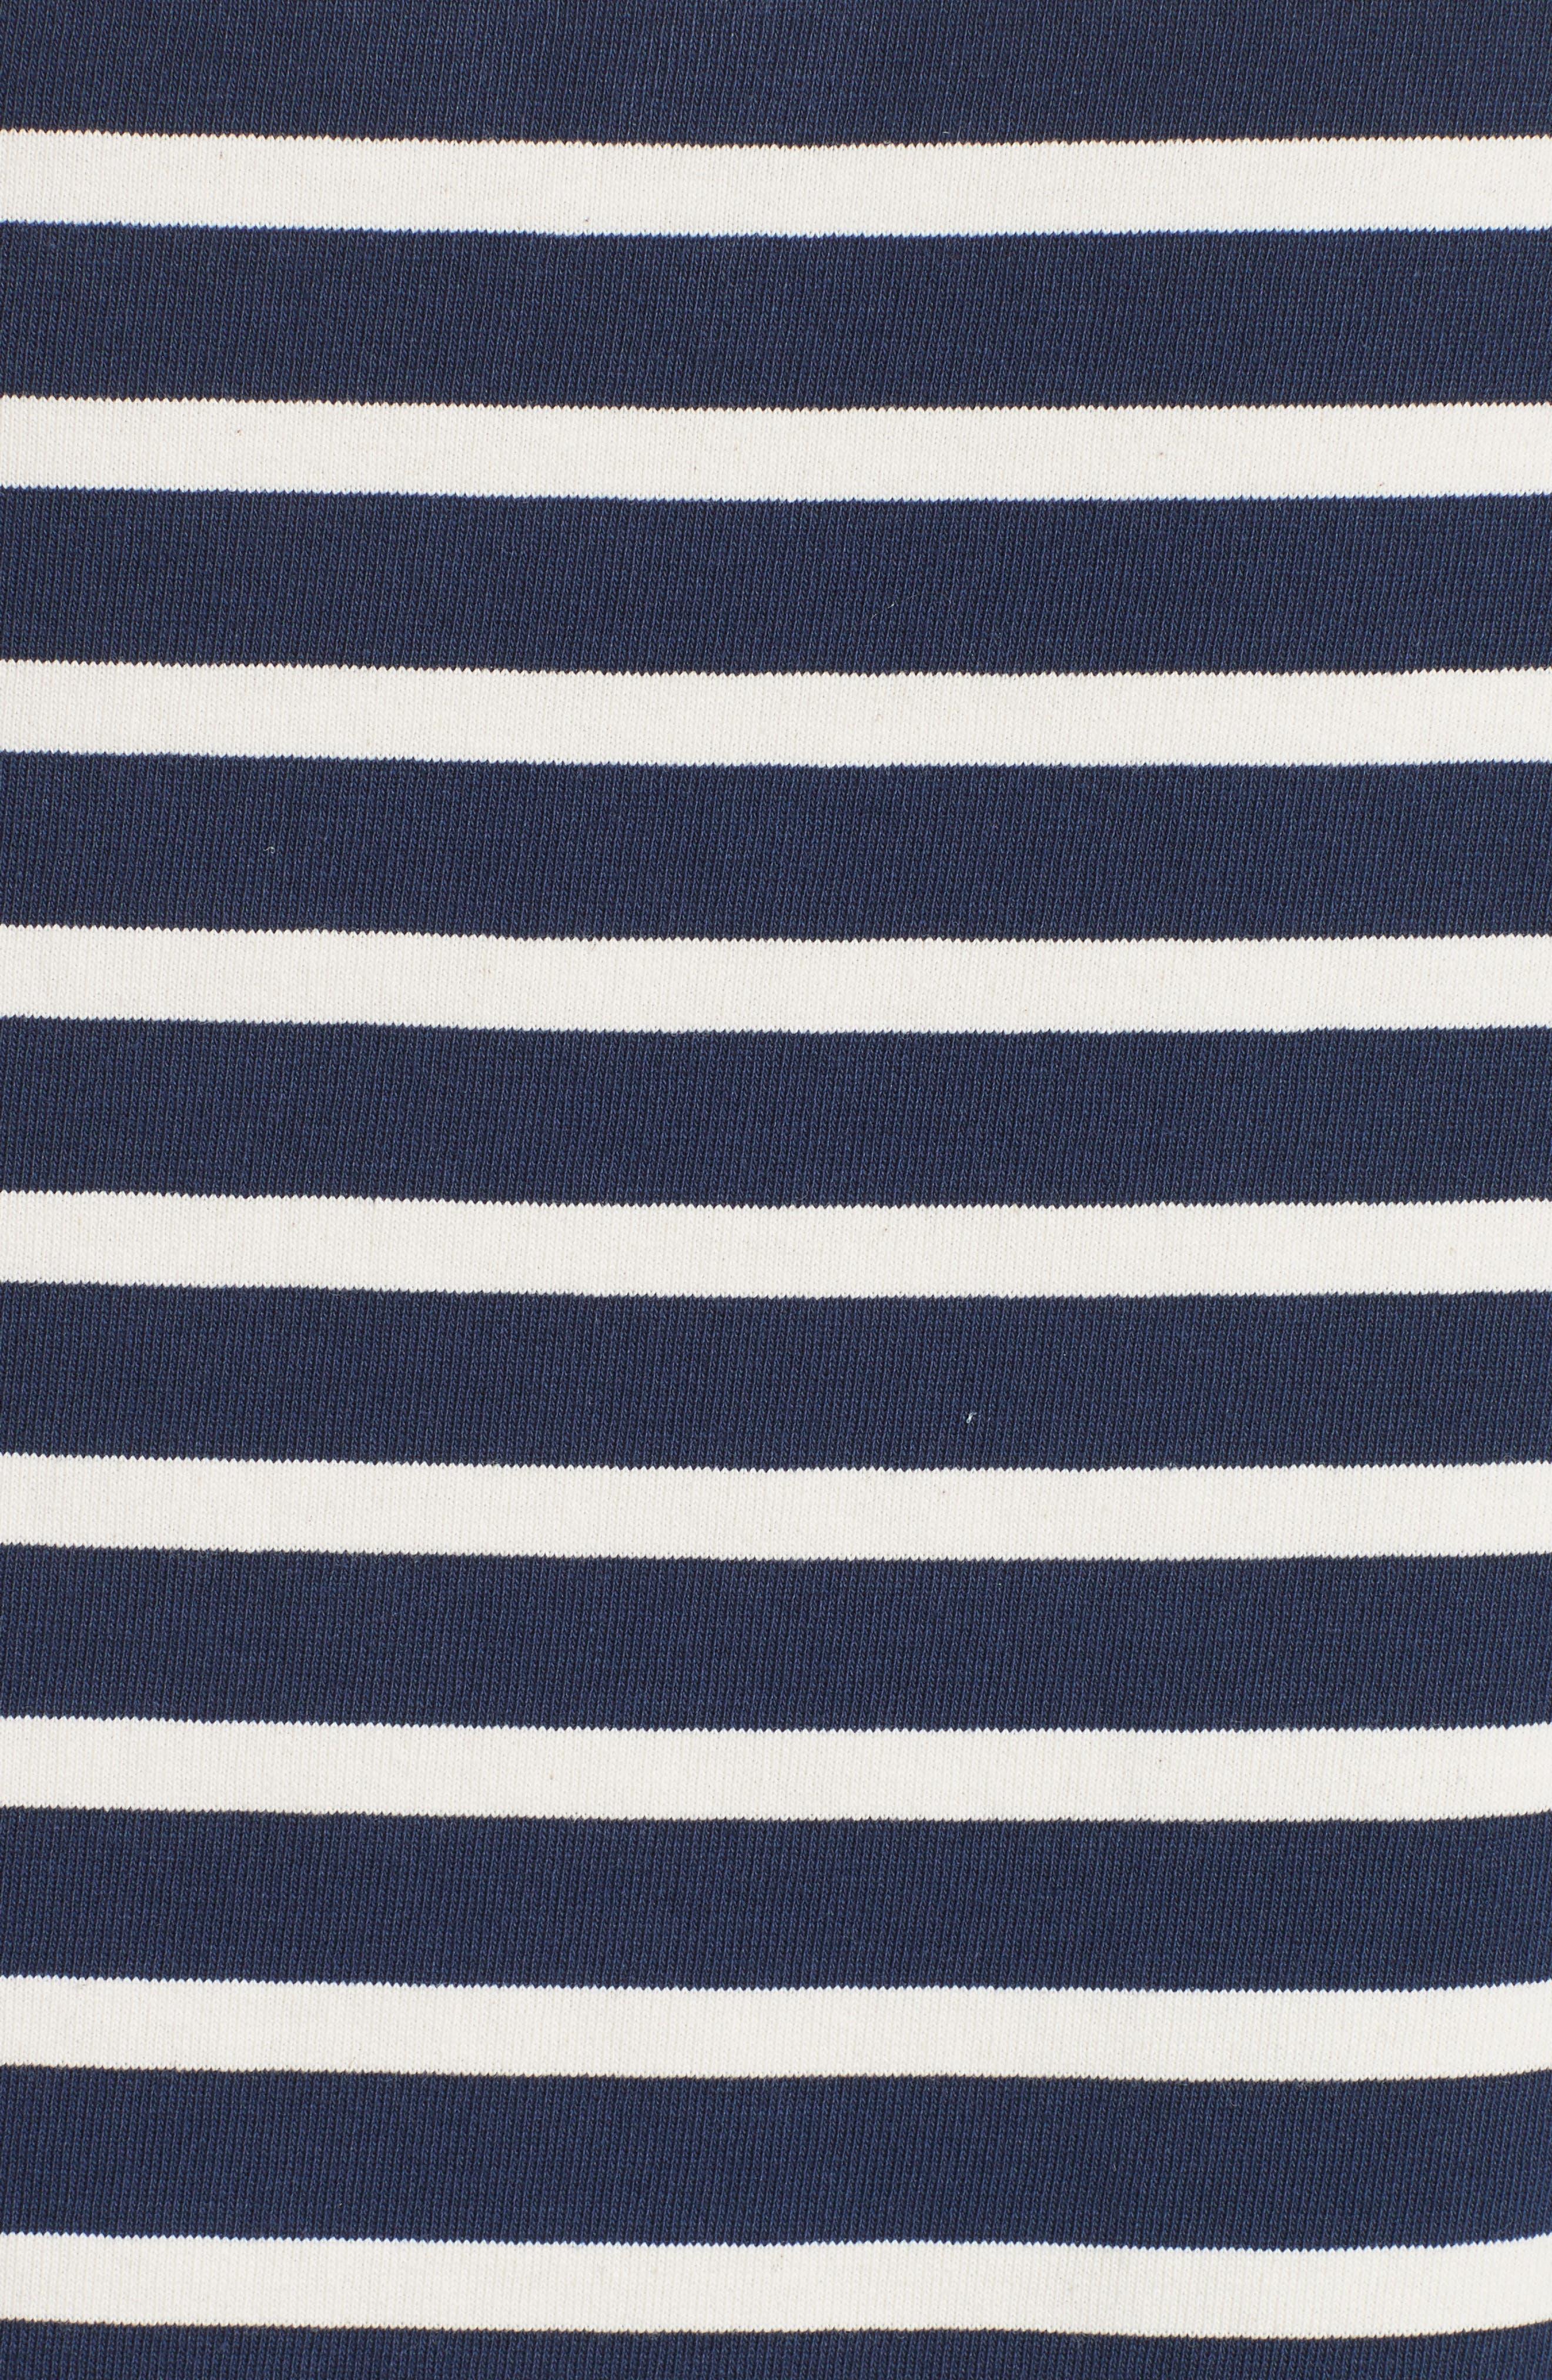 Reverse Breton Stripe Dress,                             Alternate thumbnail 3, color,                             Navy/ Ecru